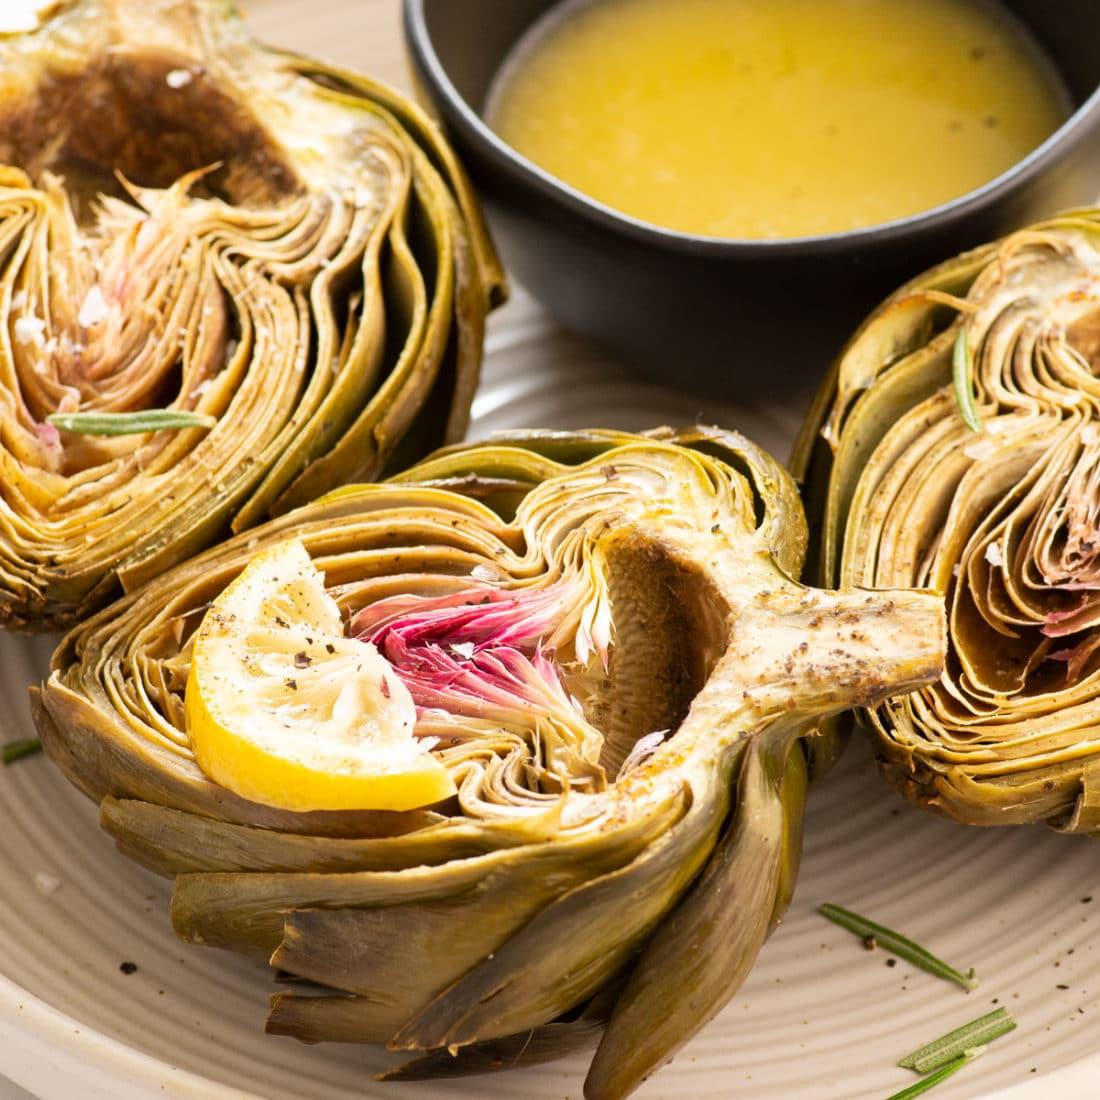 roasted artichokes on plate